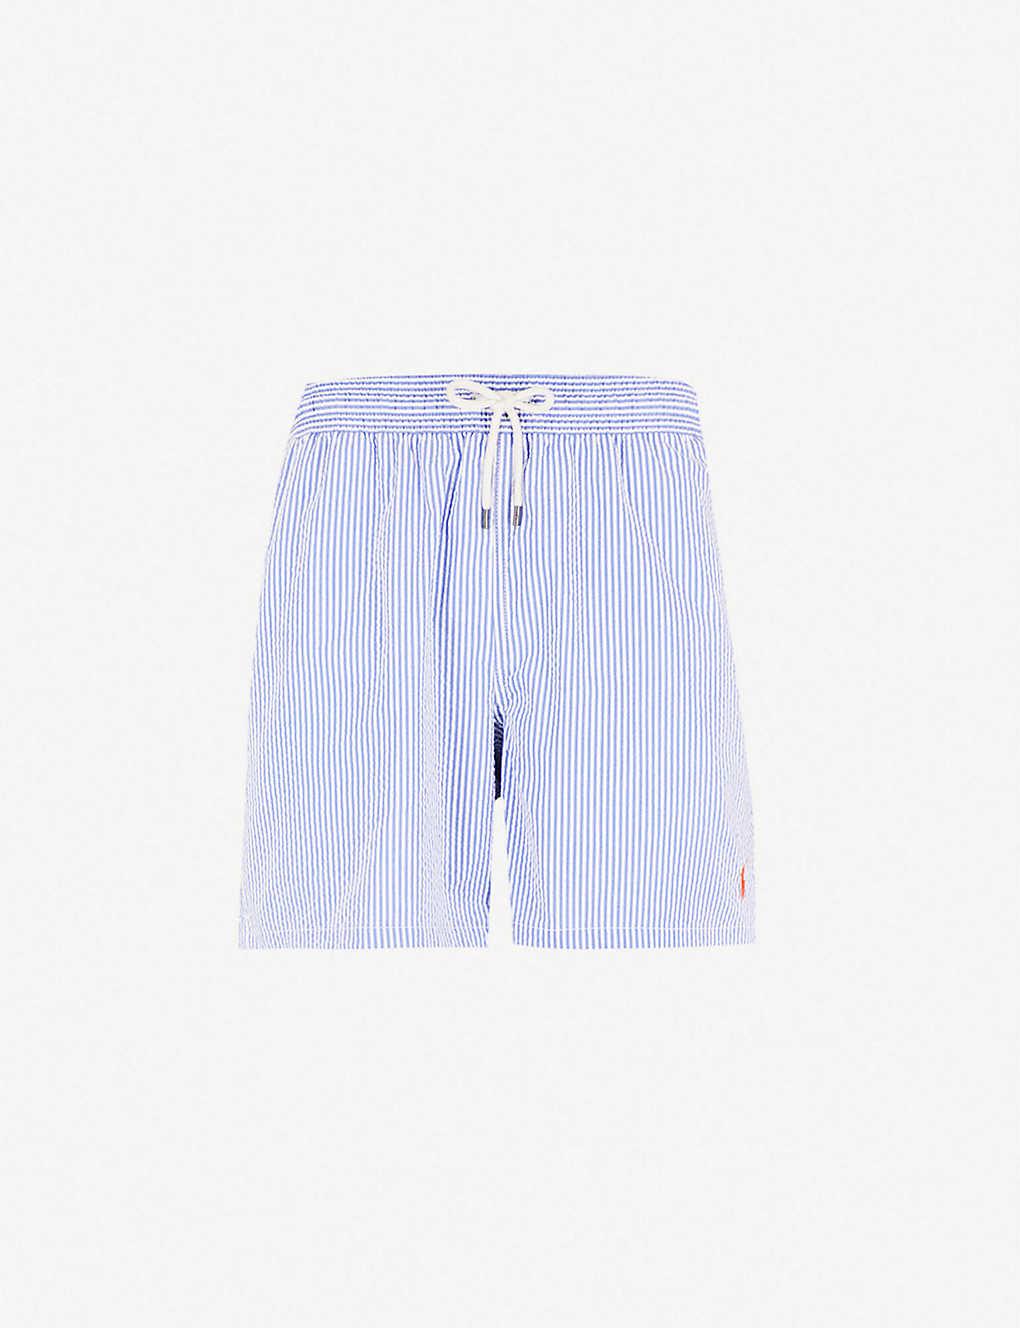 f3809eefe35c6 POLO RALPH LAUREN - Traveller striped cotton-blend swim shorts ...